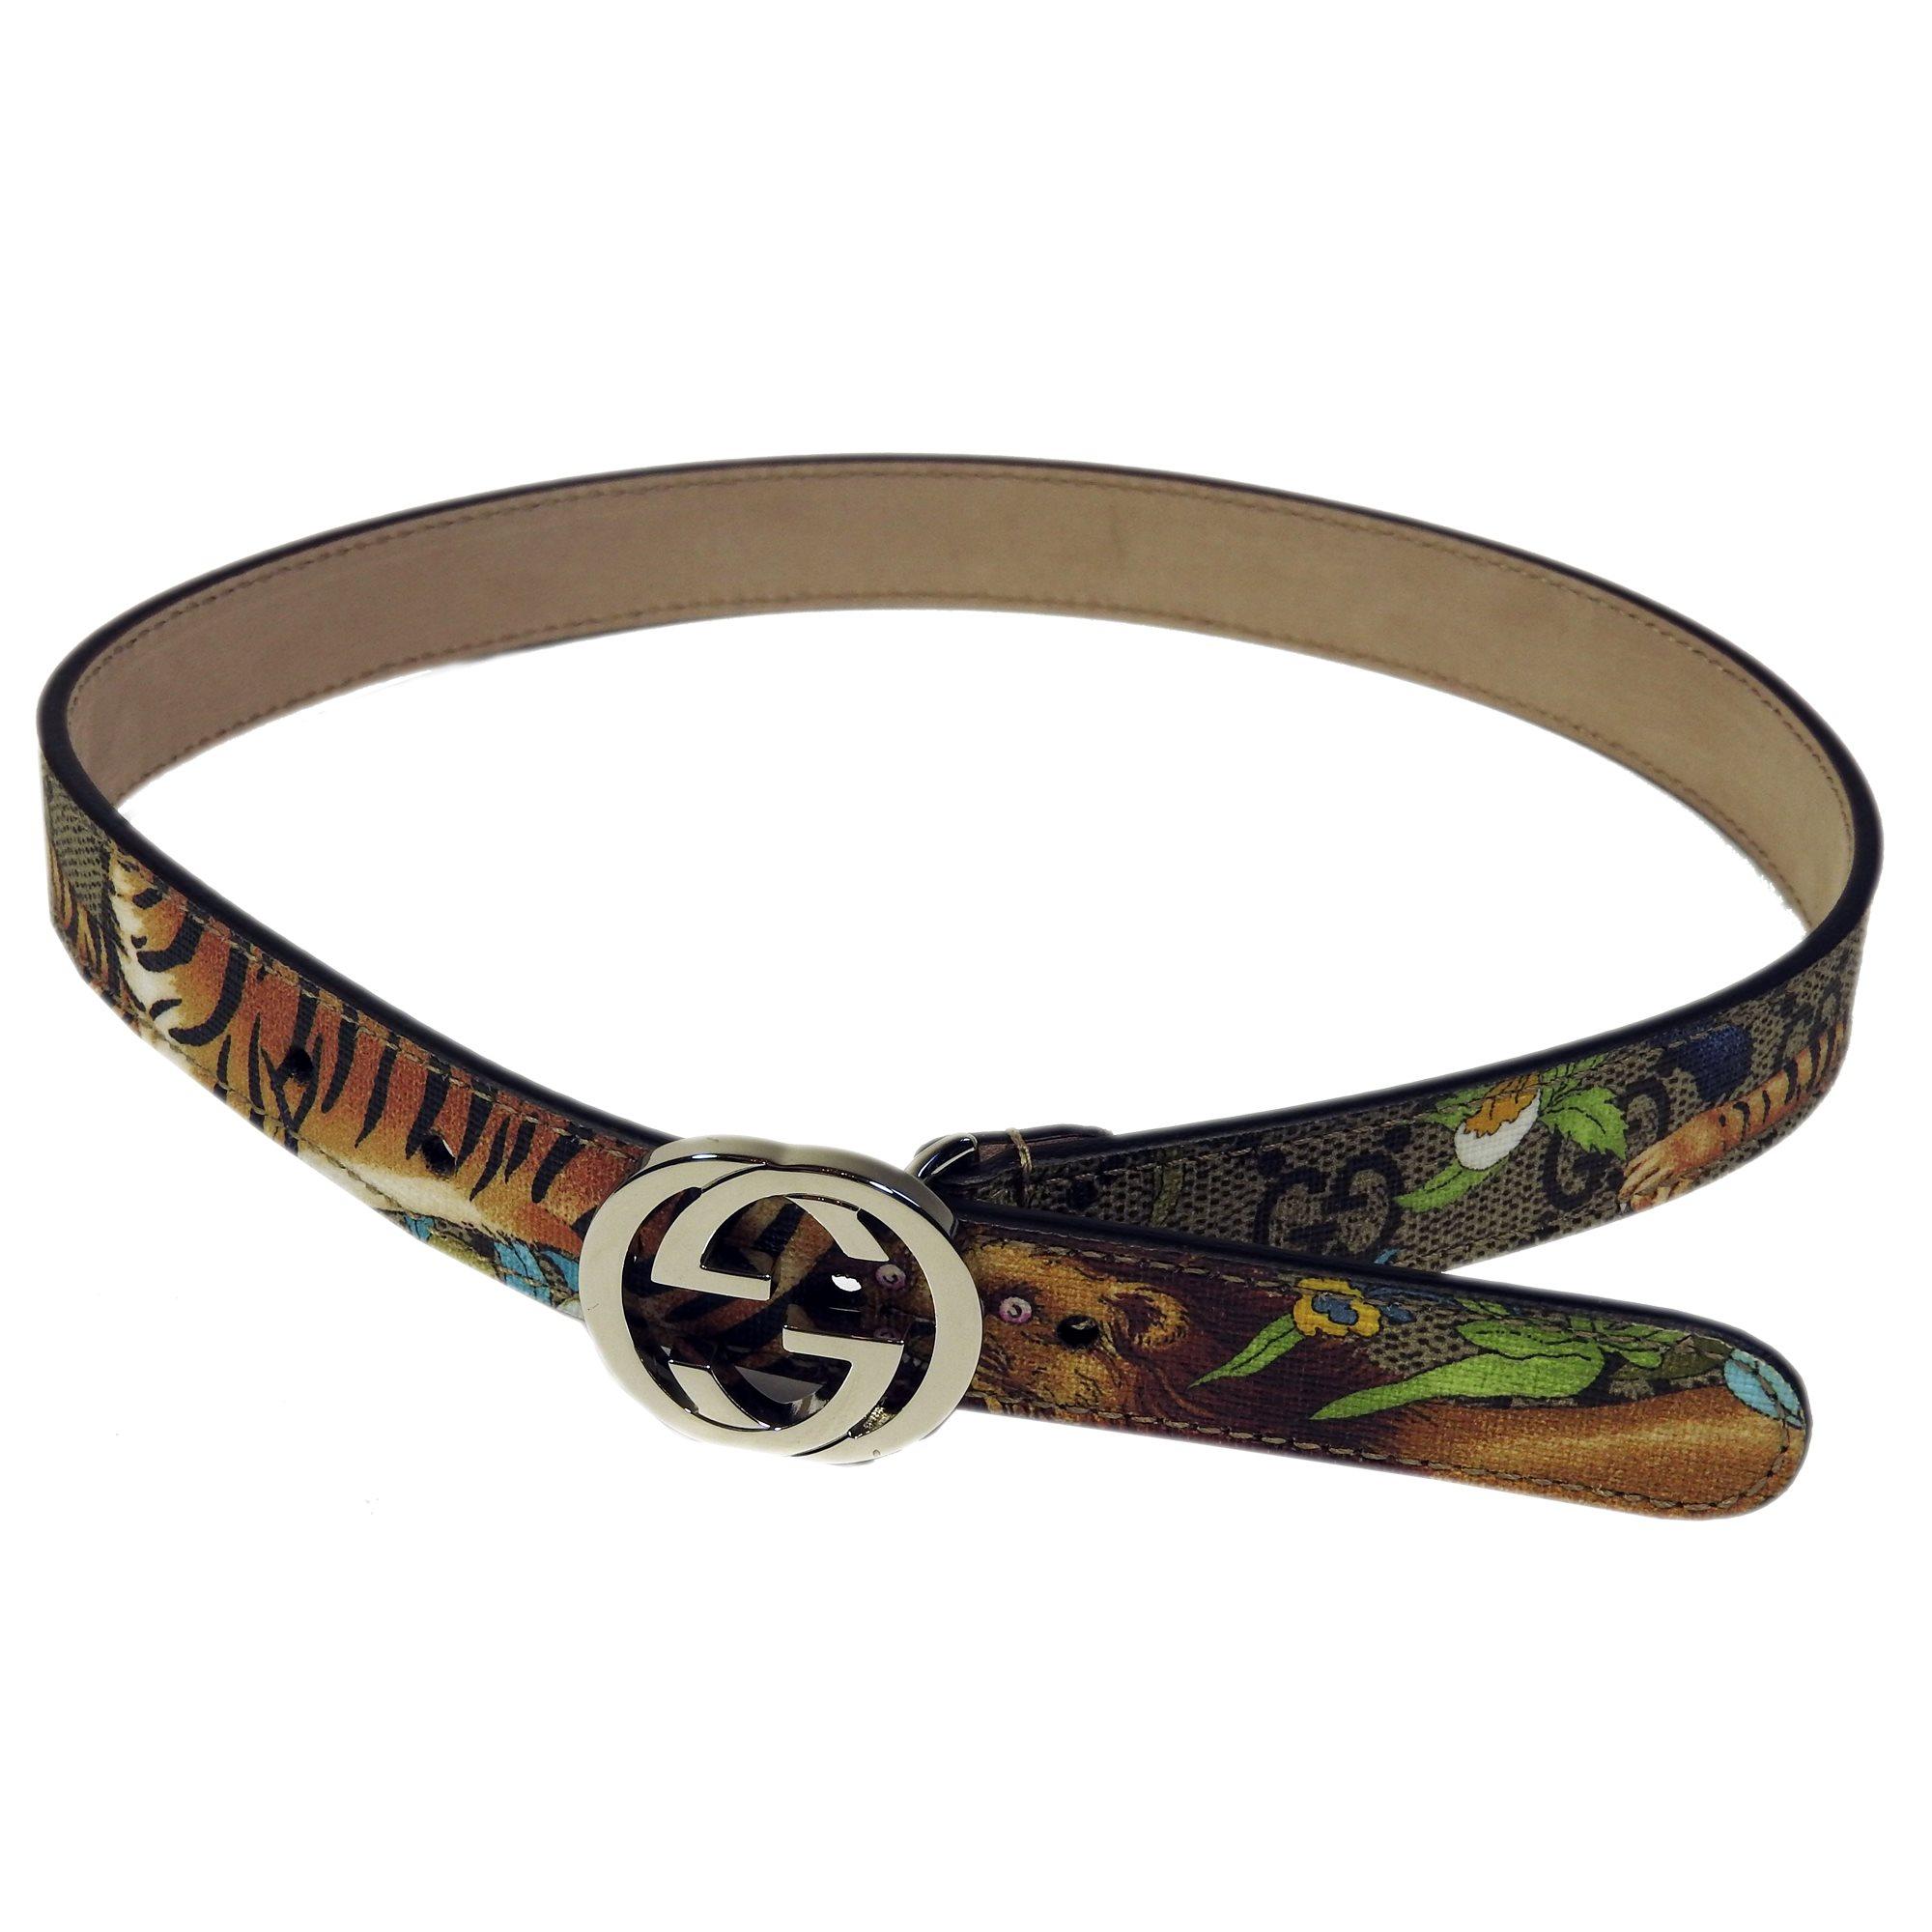 Producten - Gucci riem logo tijger - La Boite - Kids fashion u0026 shoes